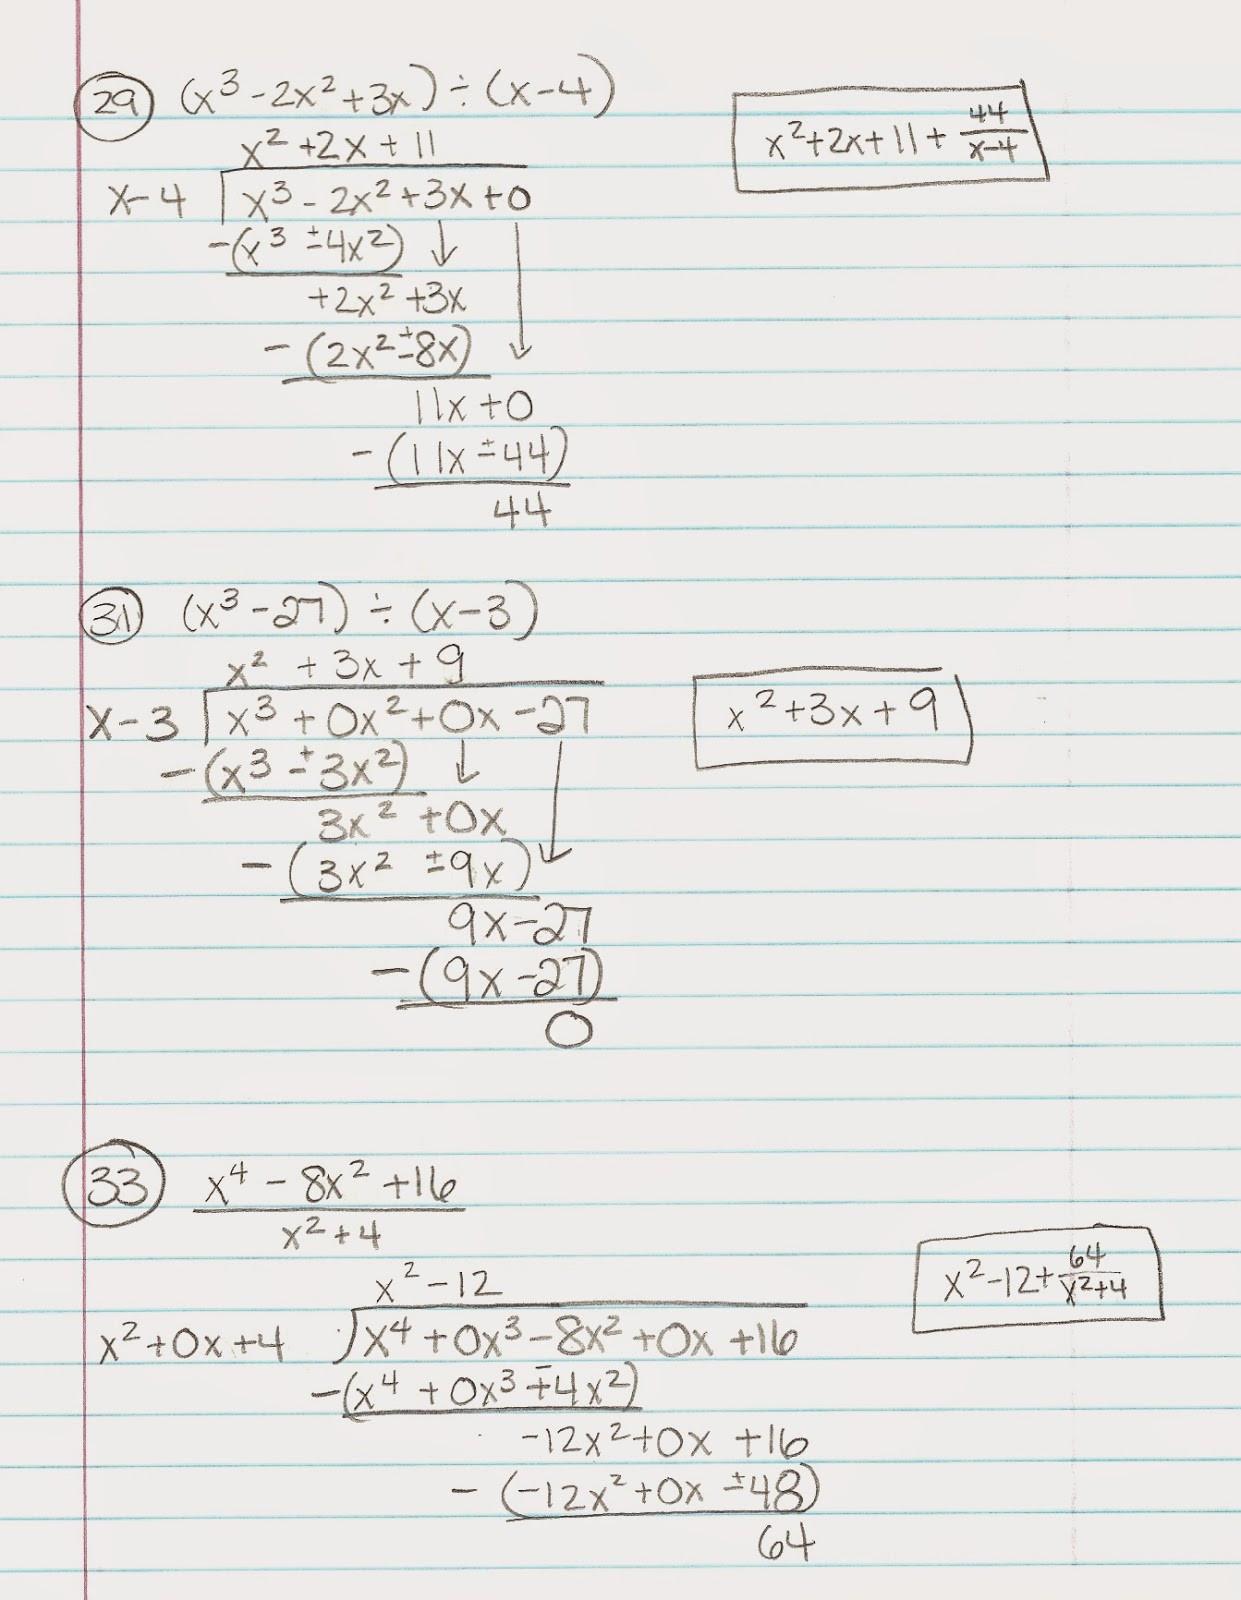 Dividing Polynomials Worksheet Answers Multiplying Polynomials Worksheet Math